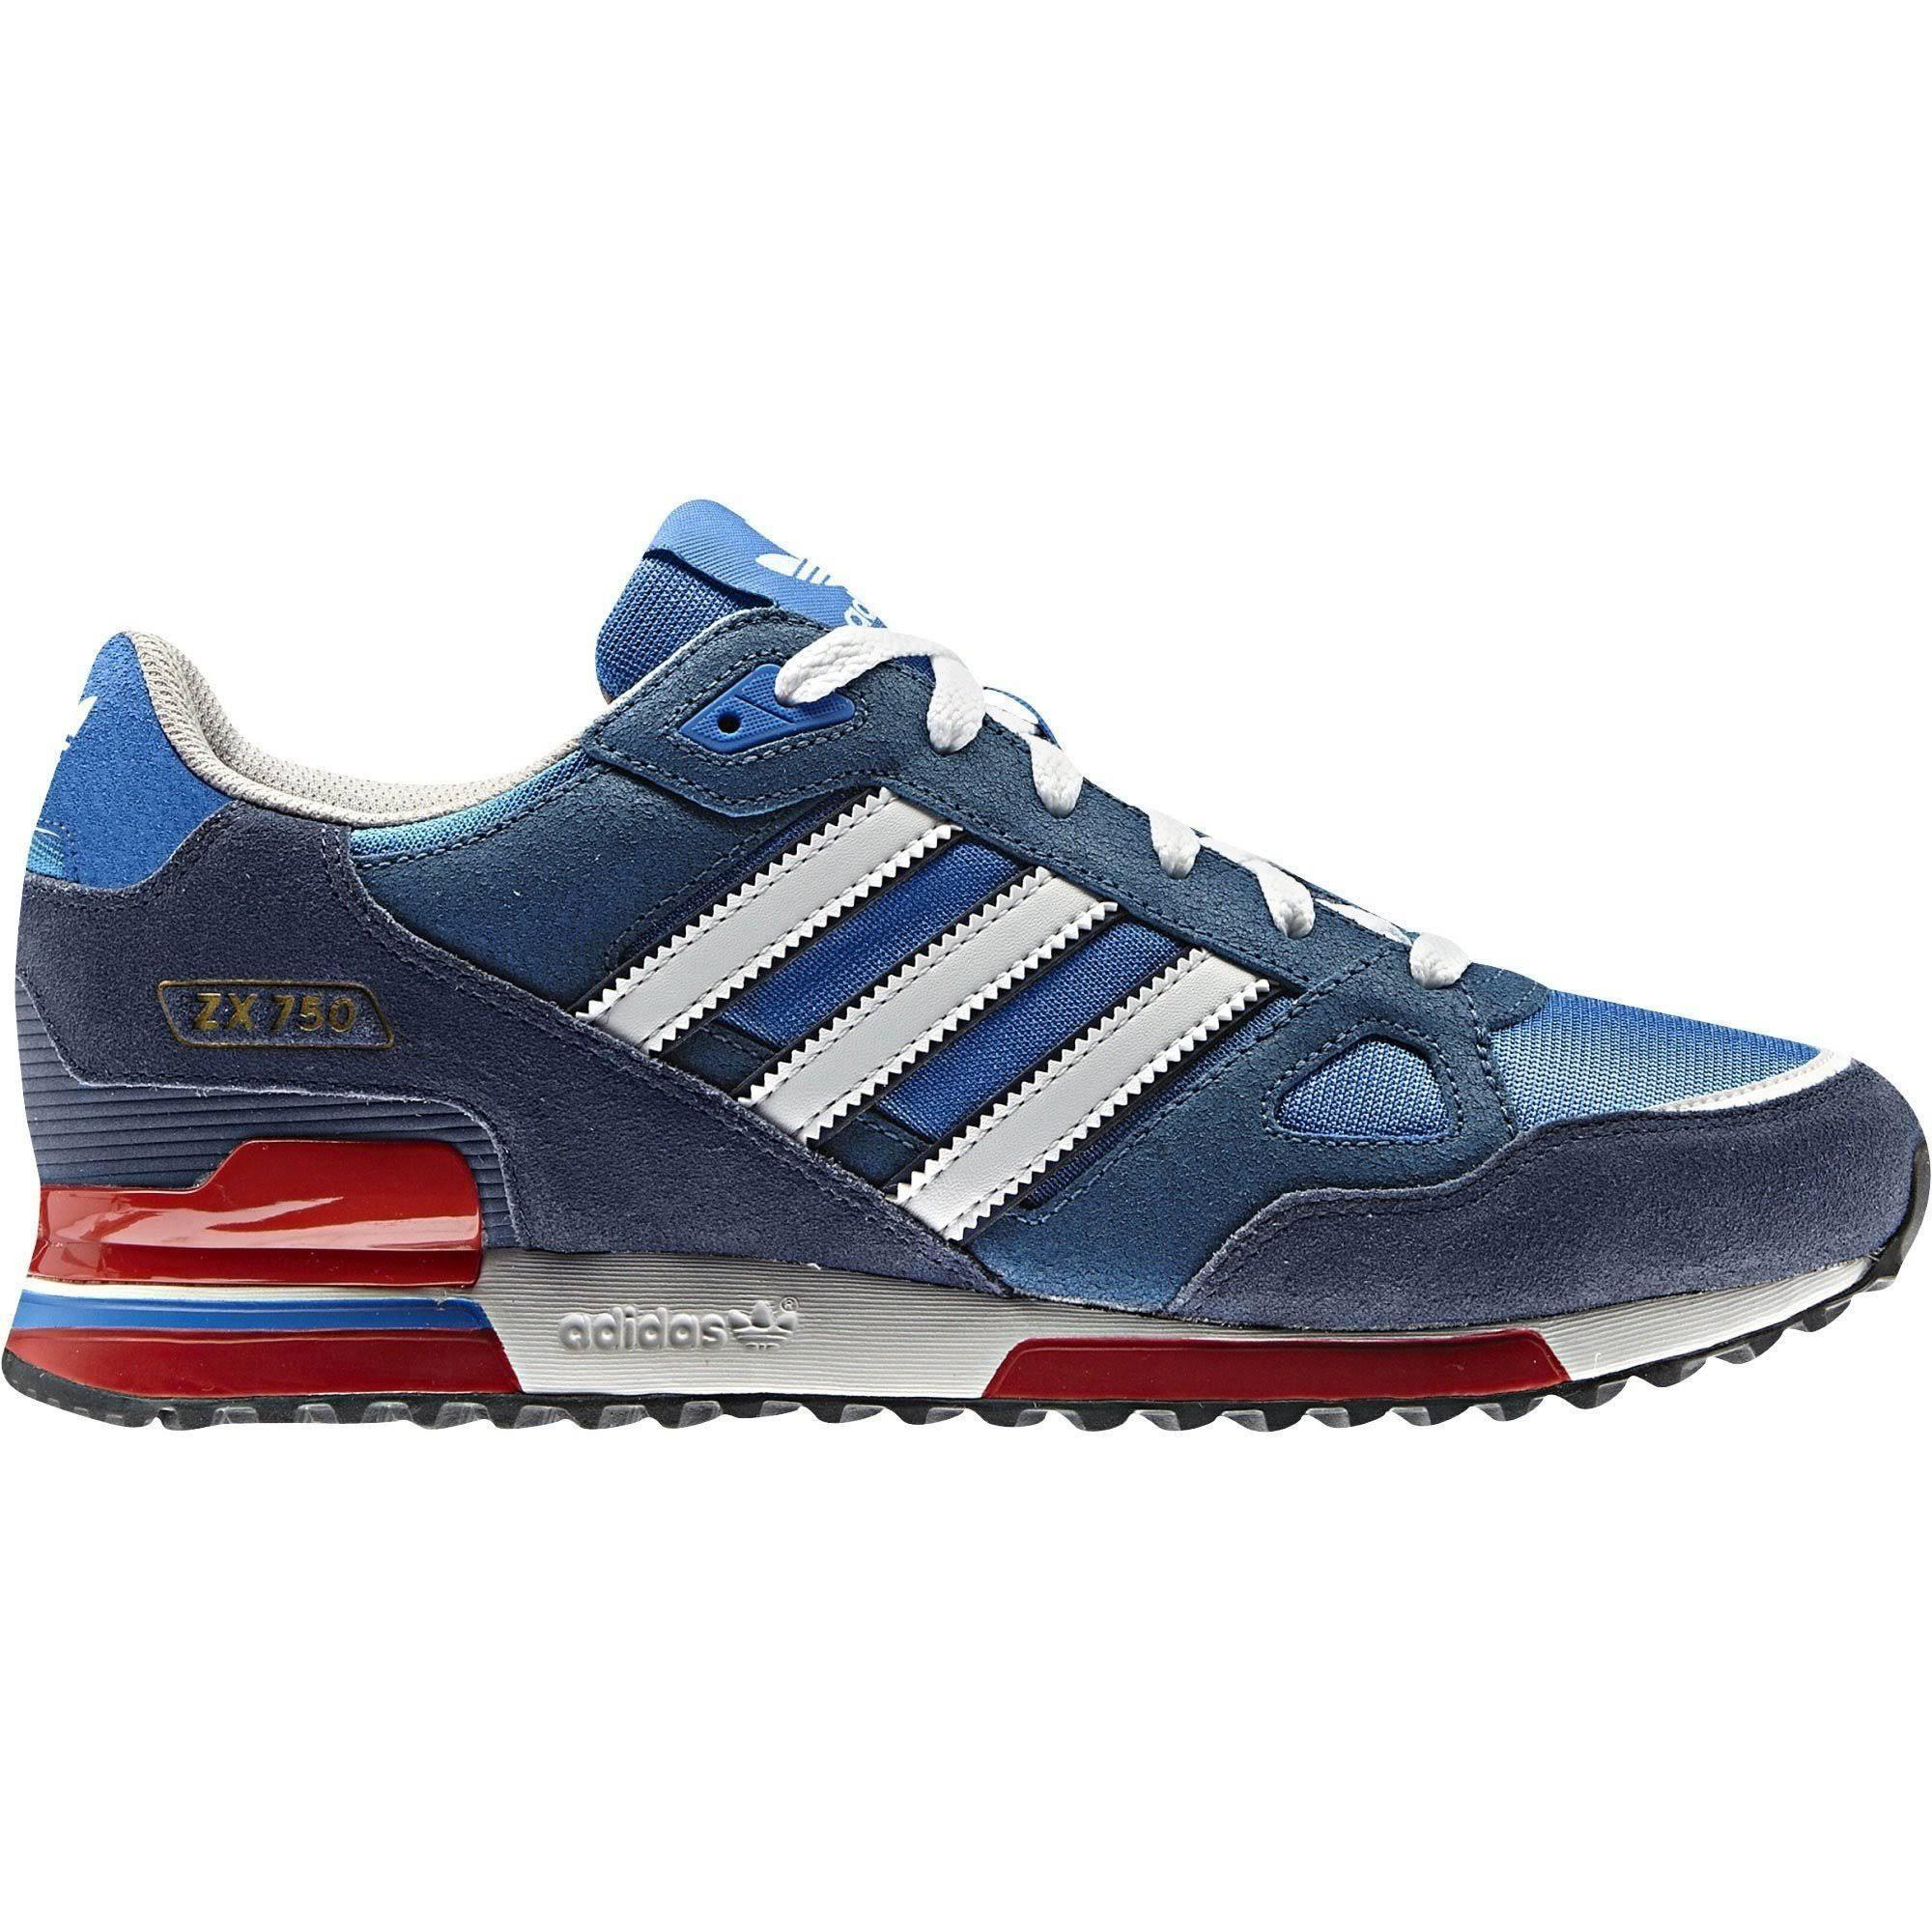 (9.5) adidas Originals ZX 750 - Blue